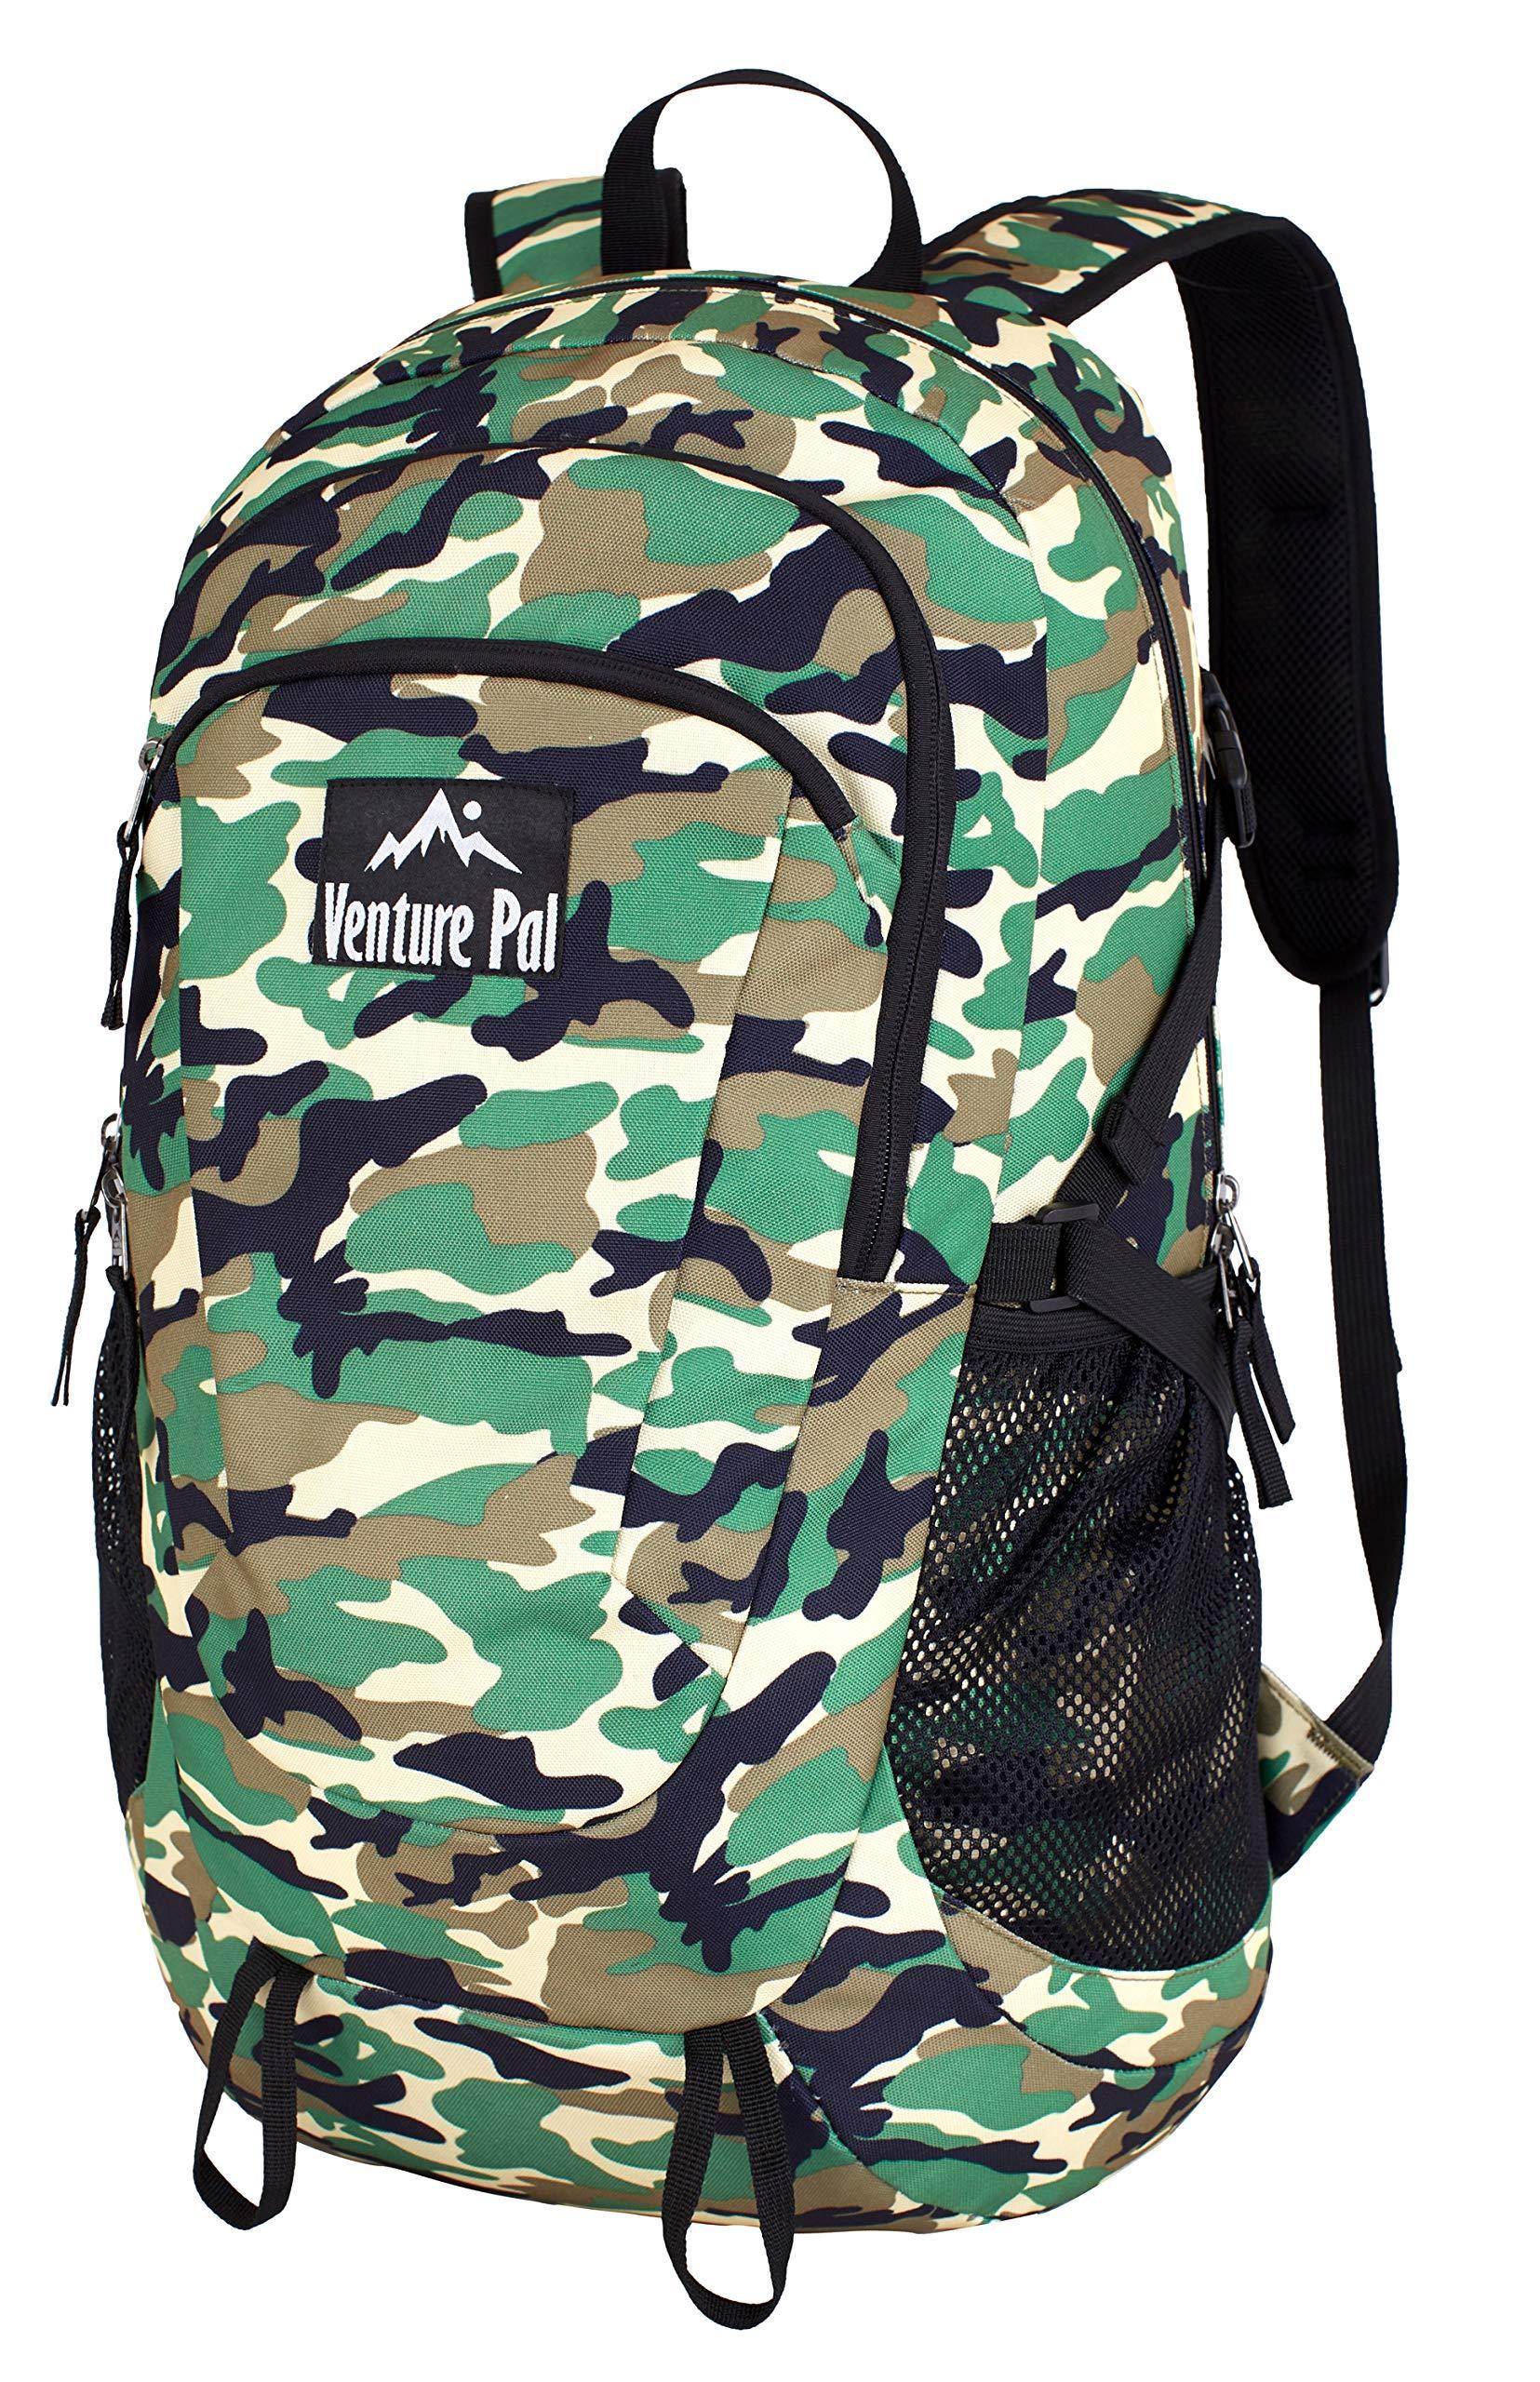 Venture Pal Large 45L Hiking Backpack - Packable Lightweight Travel Backpack Daypack(Green Camo)